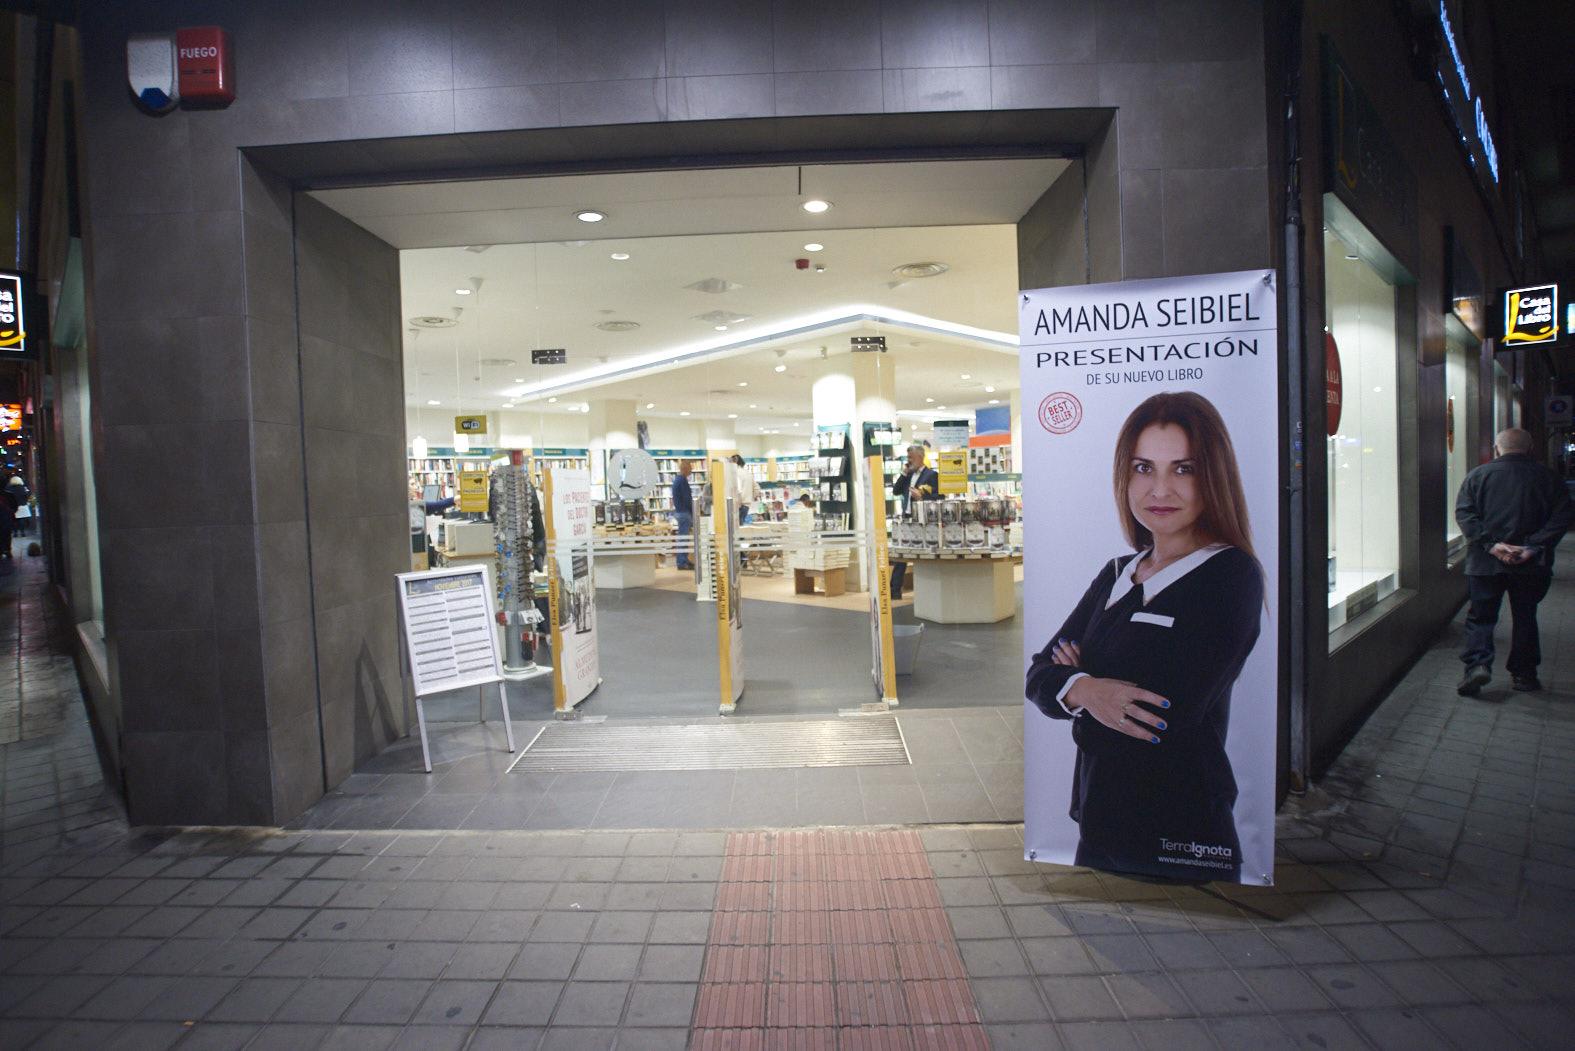 01-Publicar-un-libro-editar-Madrid-Barcelona-cataluña-españa-català-Andalucia-coedicion-autoedicion-amanda-seibiel-myr-garrido-casa-del-libro